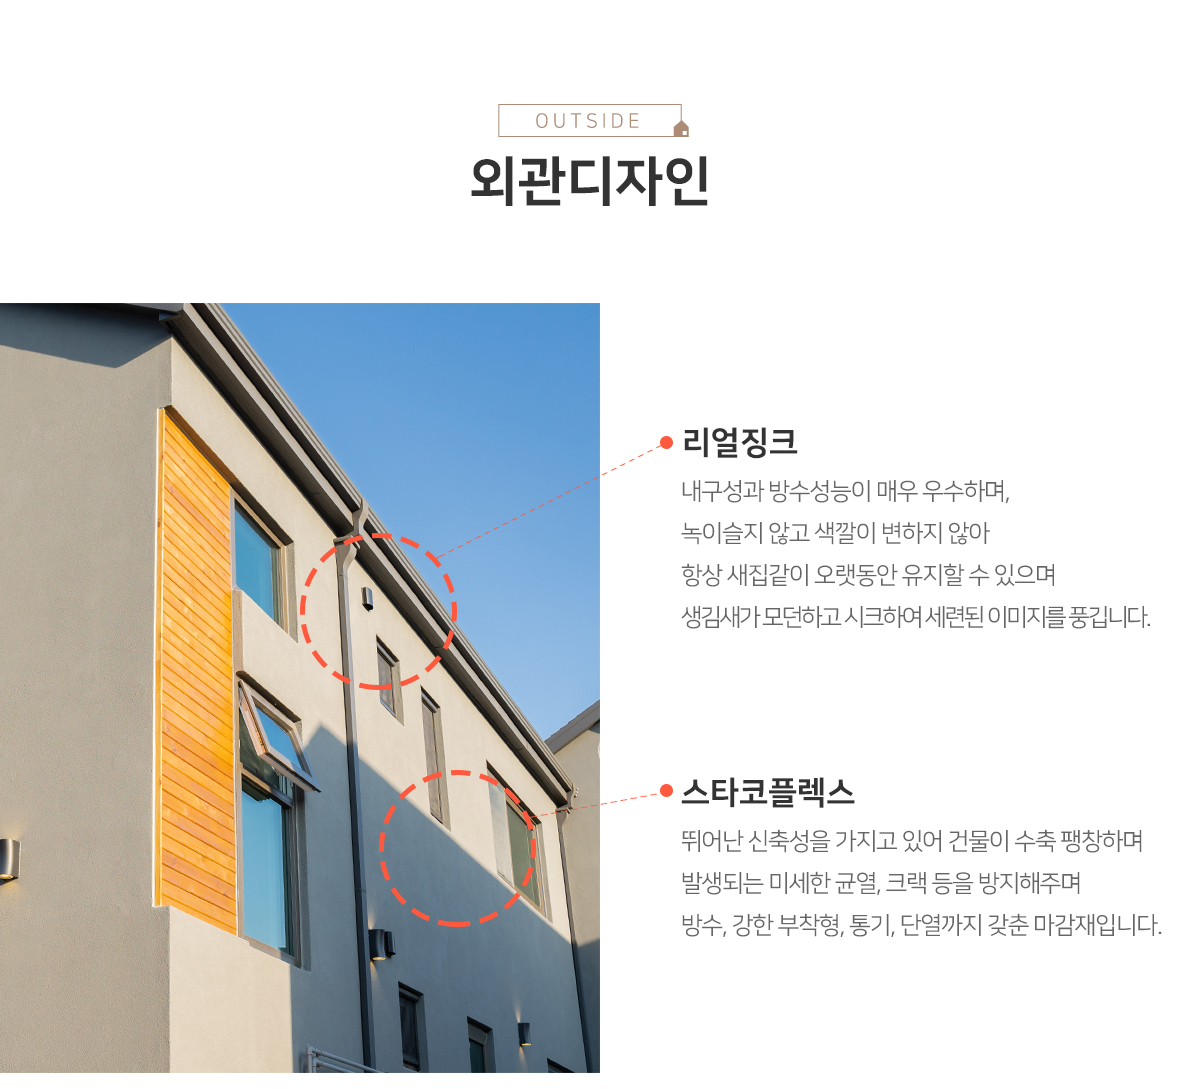 002_outside_경기-용인-기흥구-중동_이문식_01.jpg